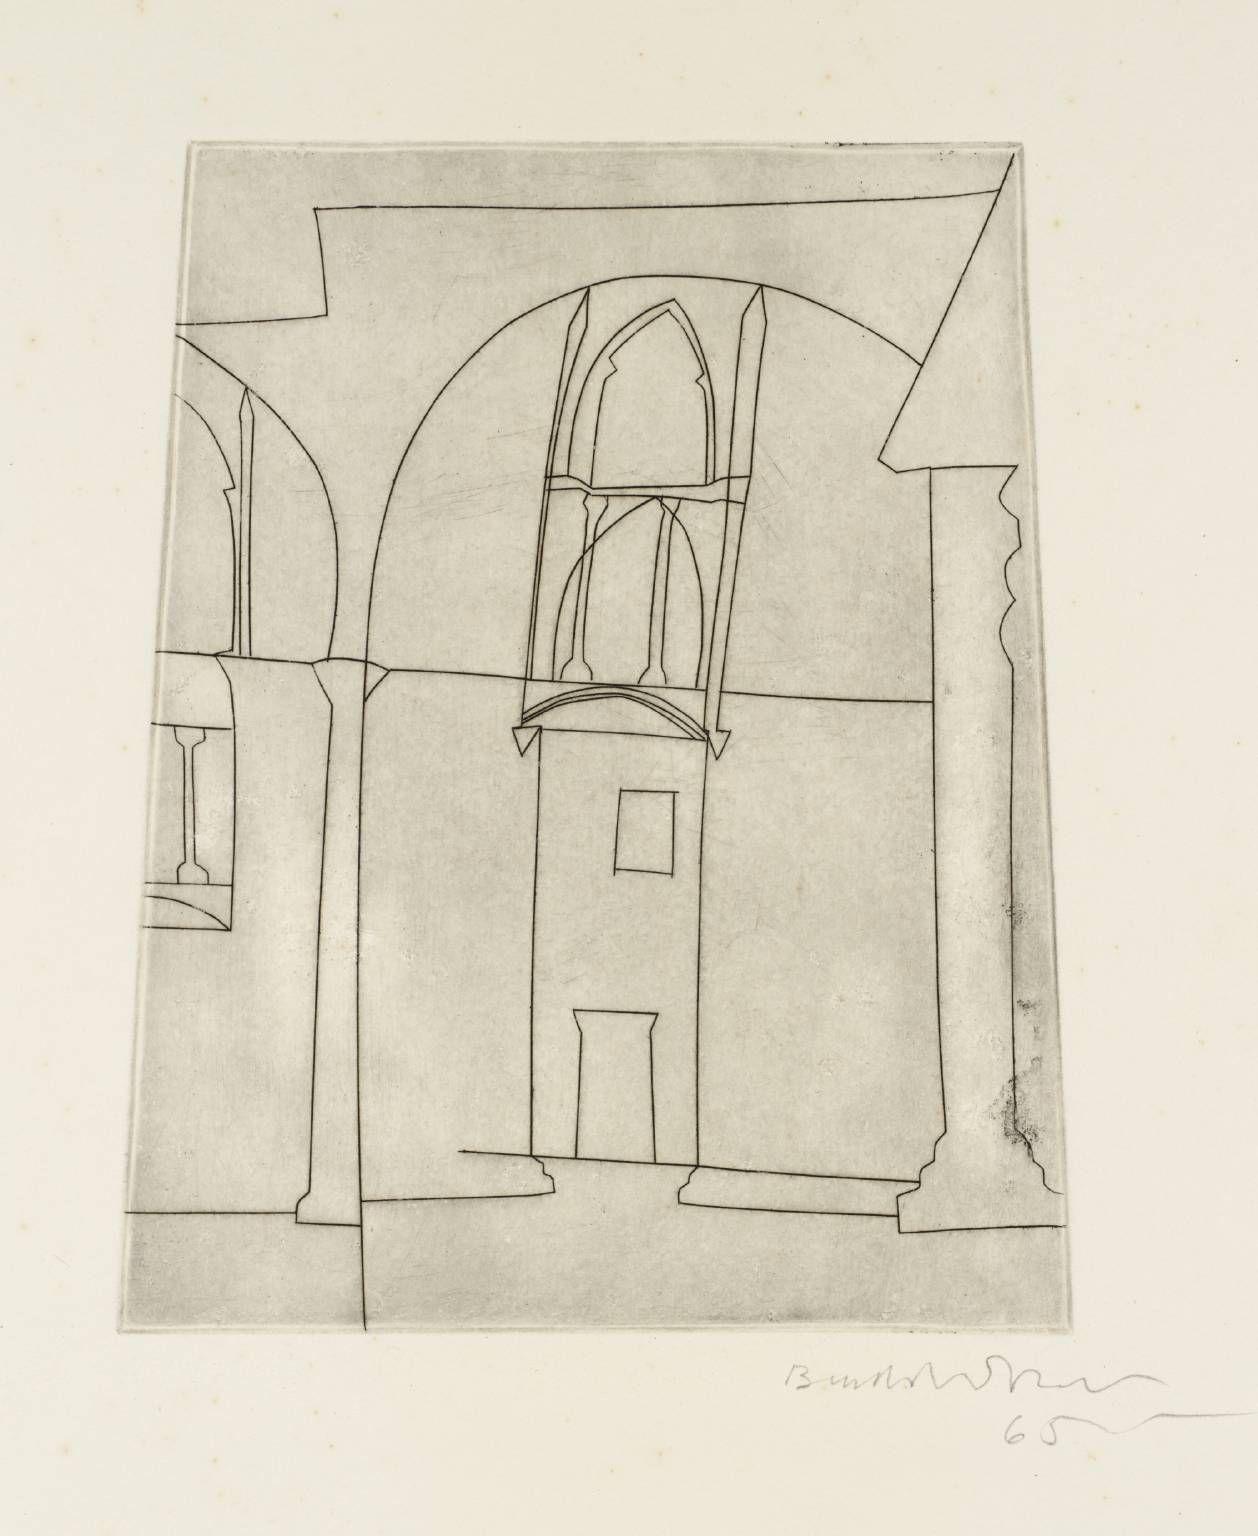 Ben Nicholson OM 'small silent siena', 1965 © Angela Verren Taunt 2014. All rights reserved, DACS